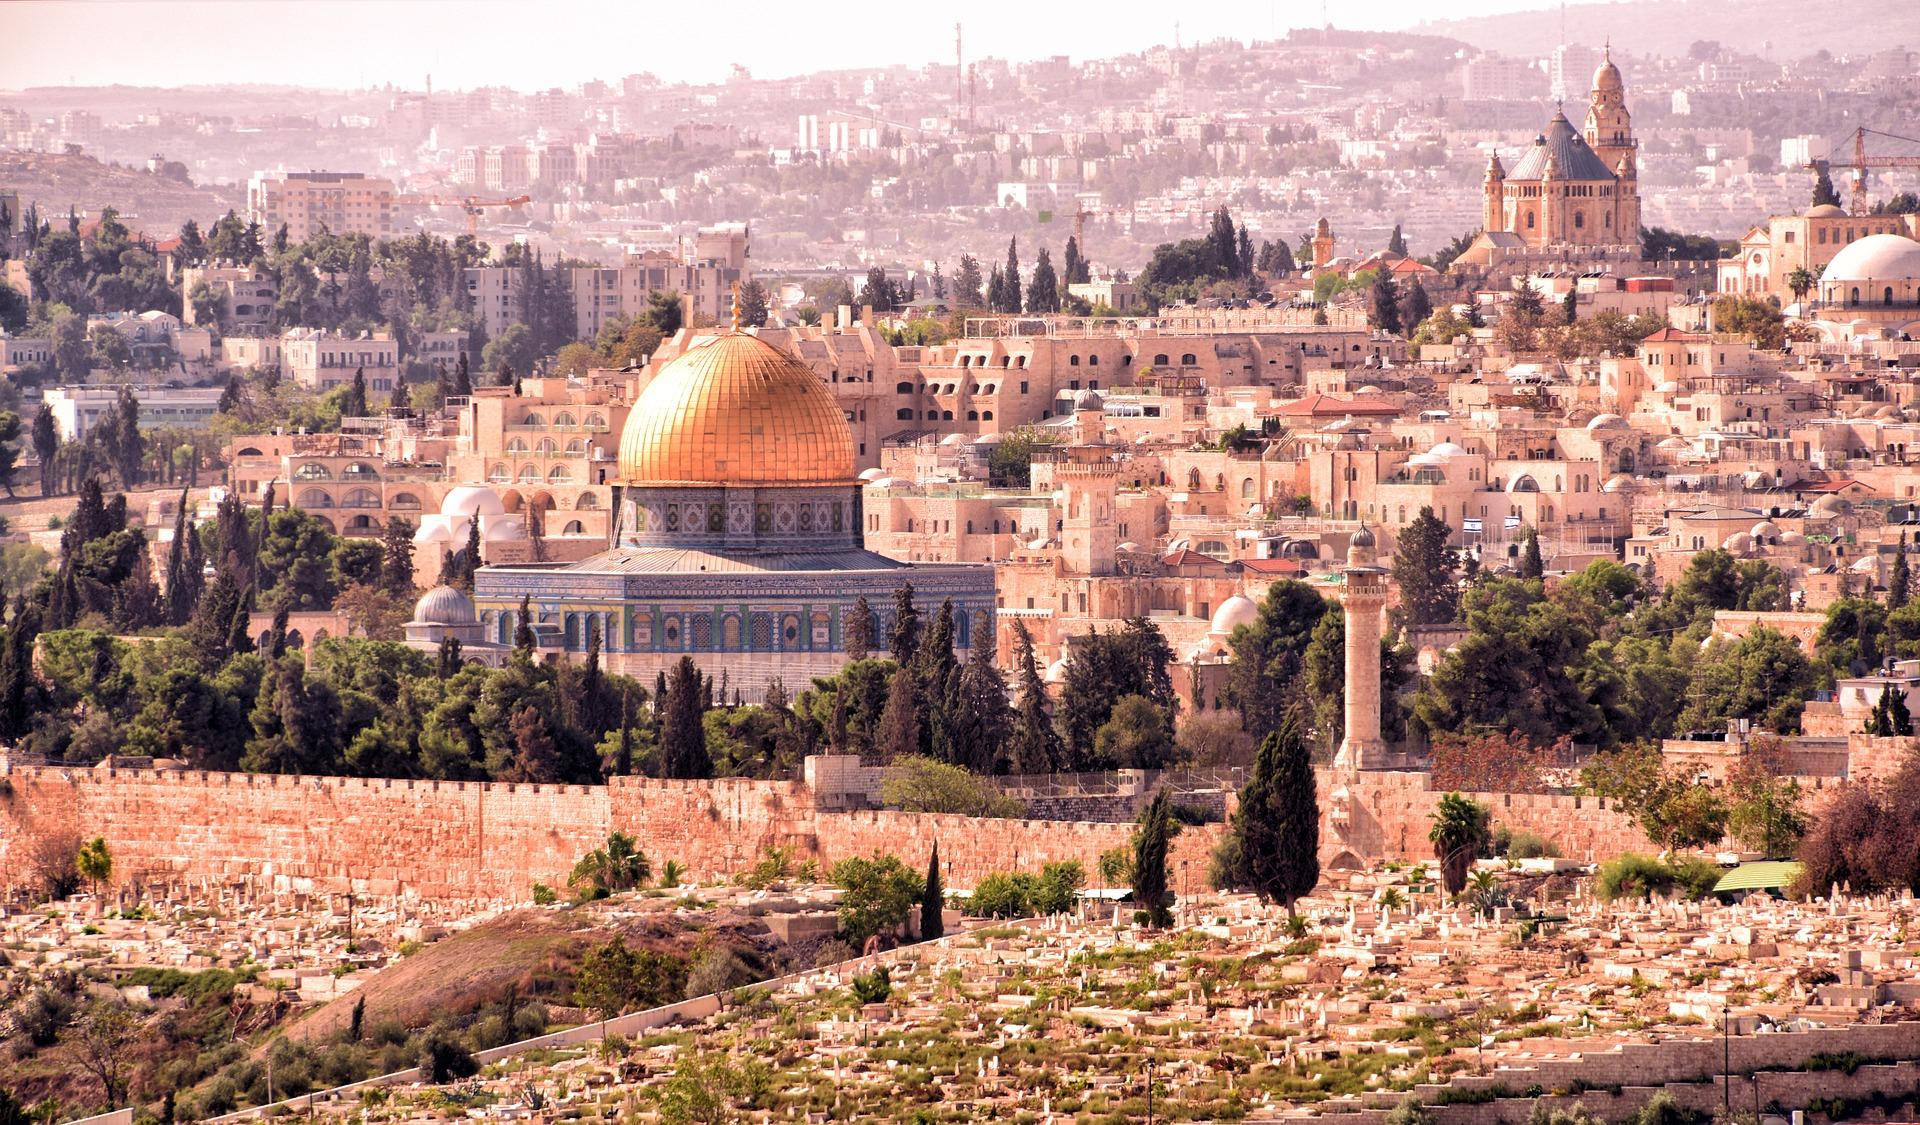 Jerusalem. Credit: Pixabay